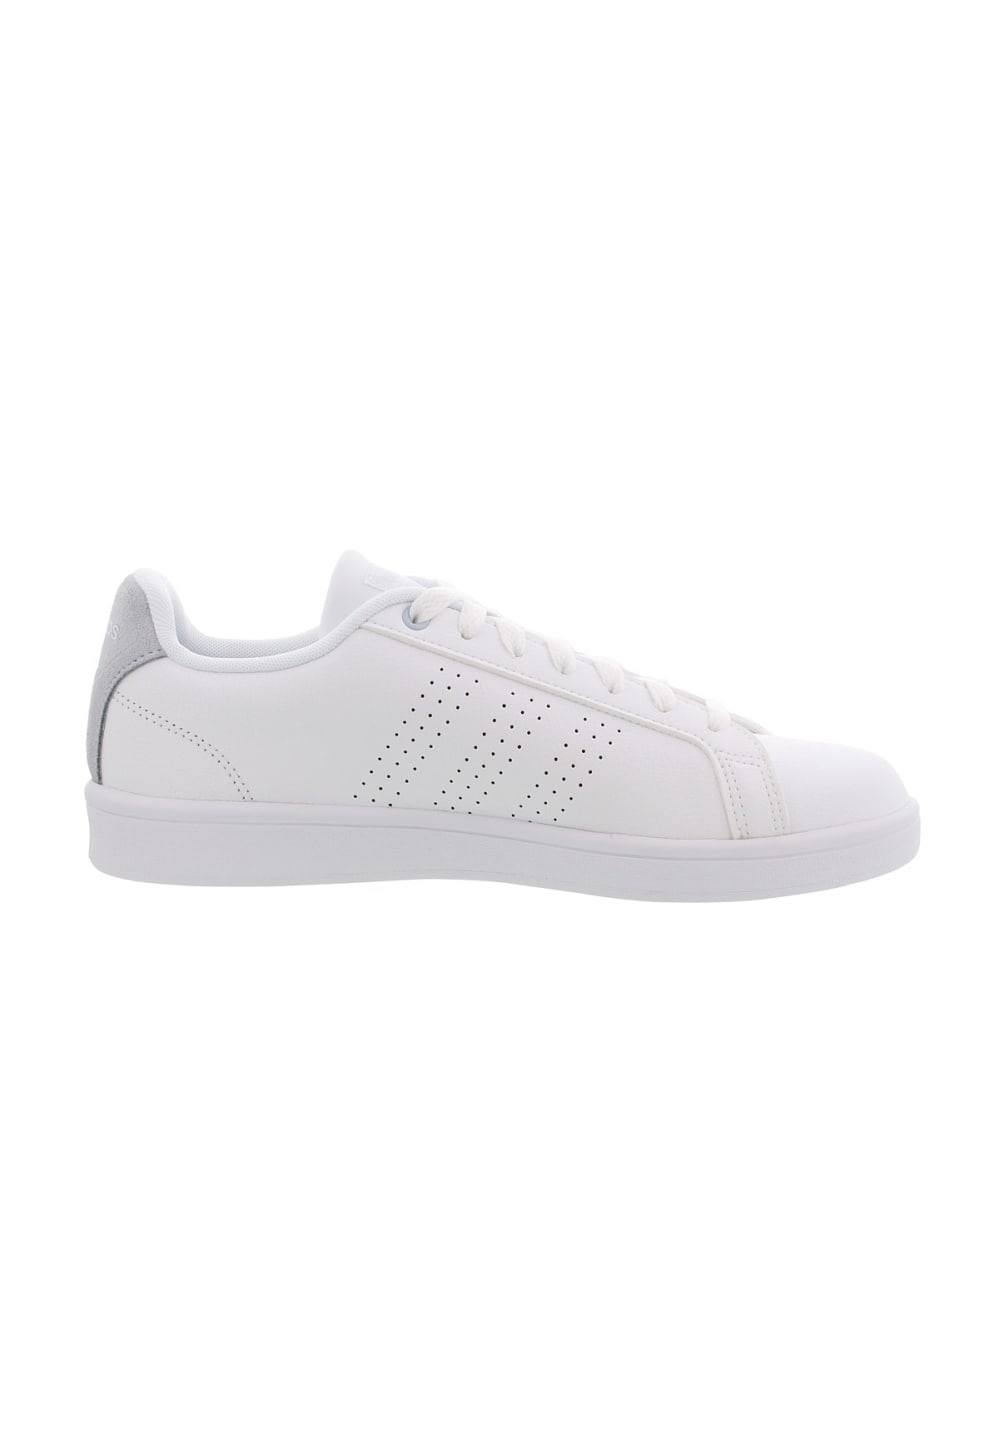 adidas femme neo blanche